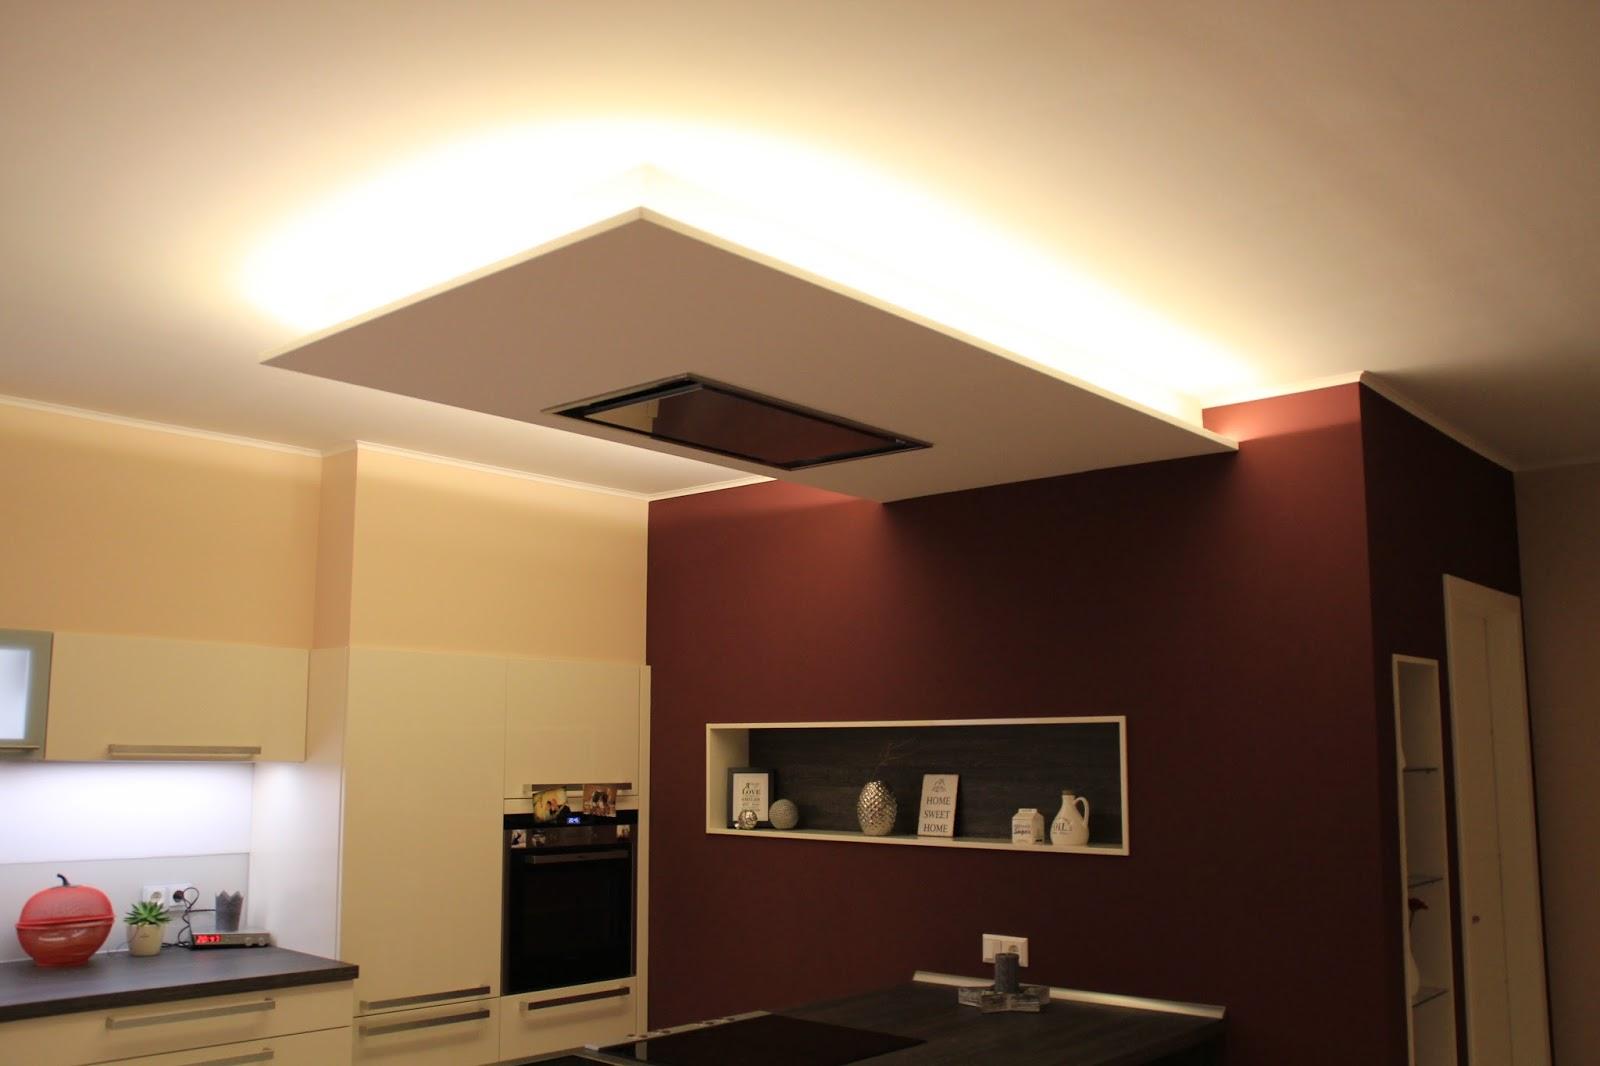 jucheer testet led wunderland warme lichtakzente f r. Black Bedroom Furniture Sets. Home Design Ideas